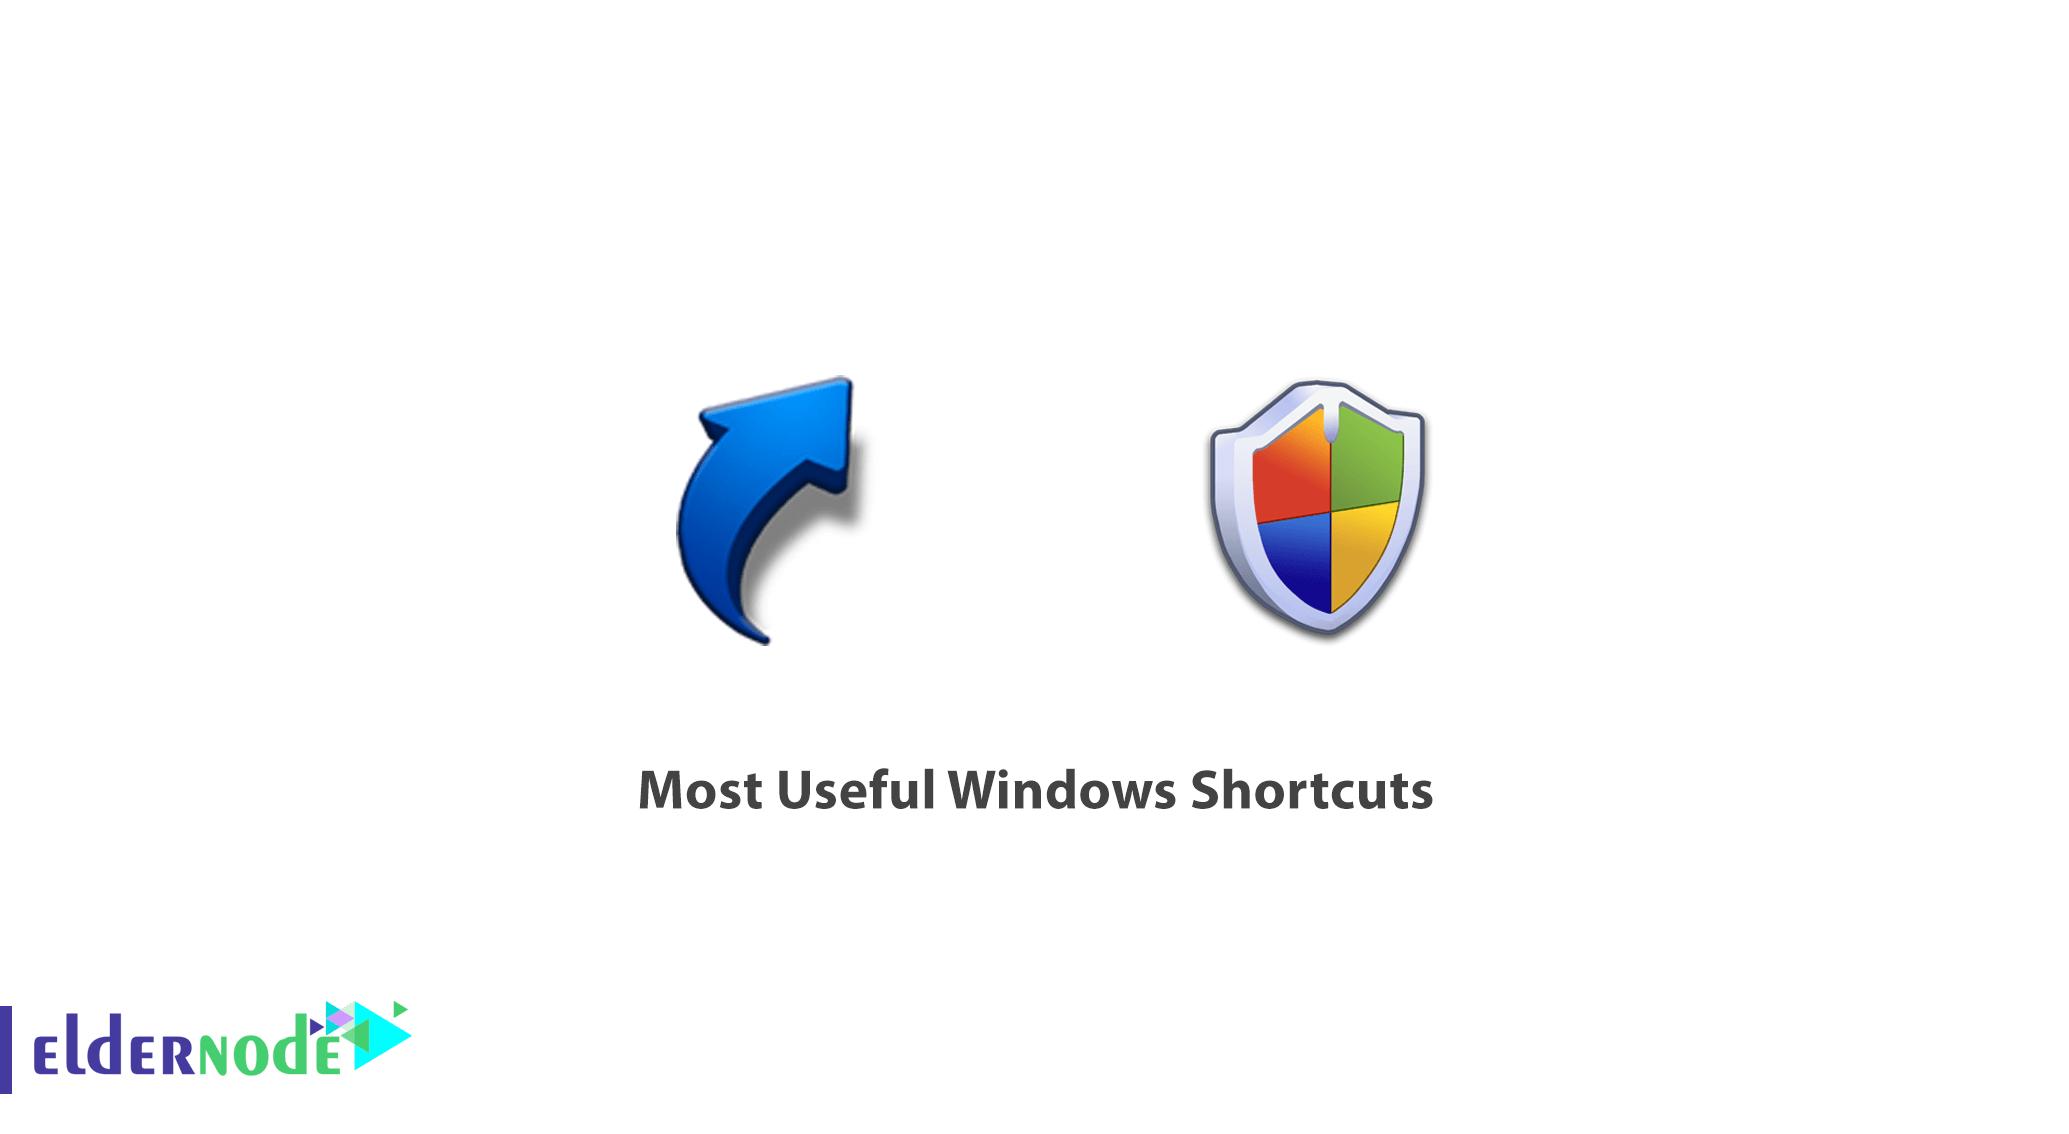 Most Useful Windows Shortcuts